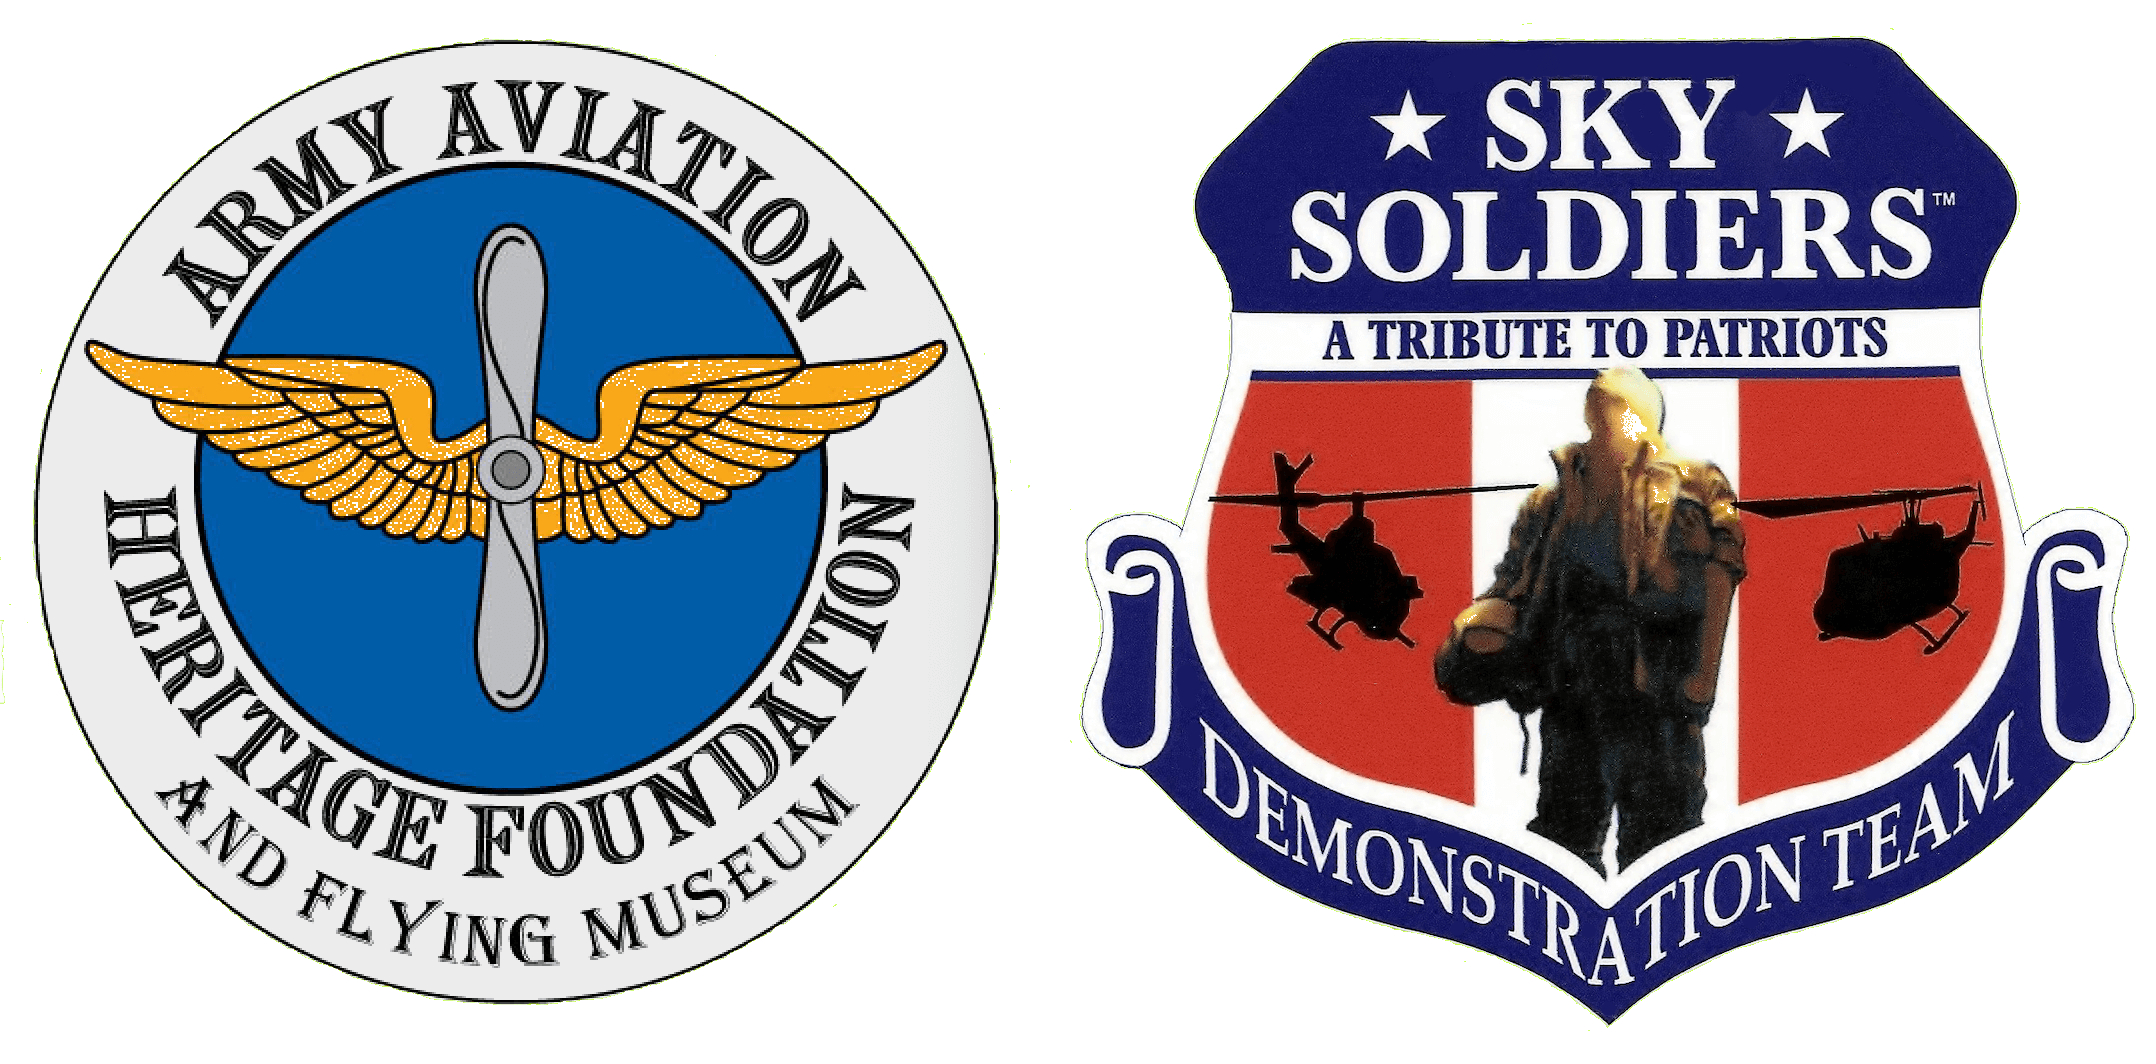 Army Aviation Heritage Foundation